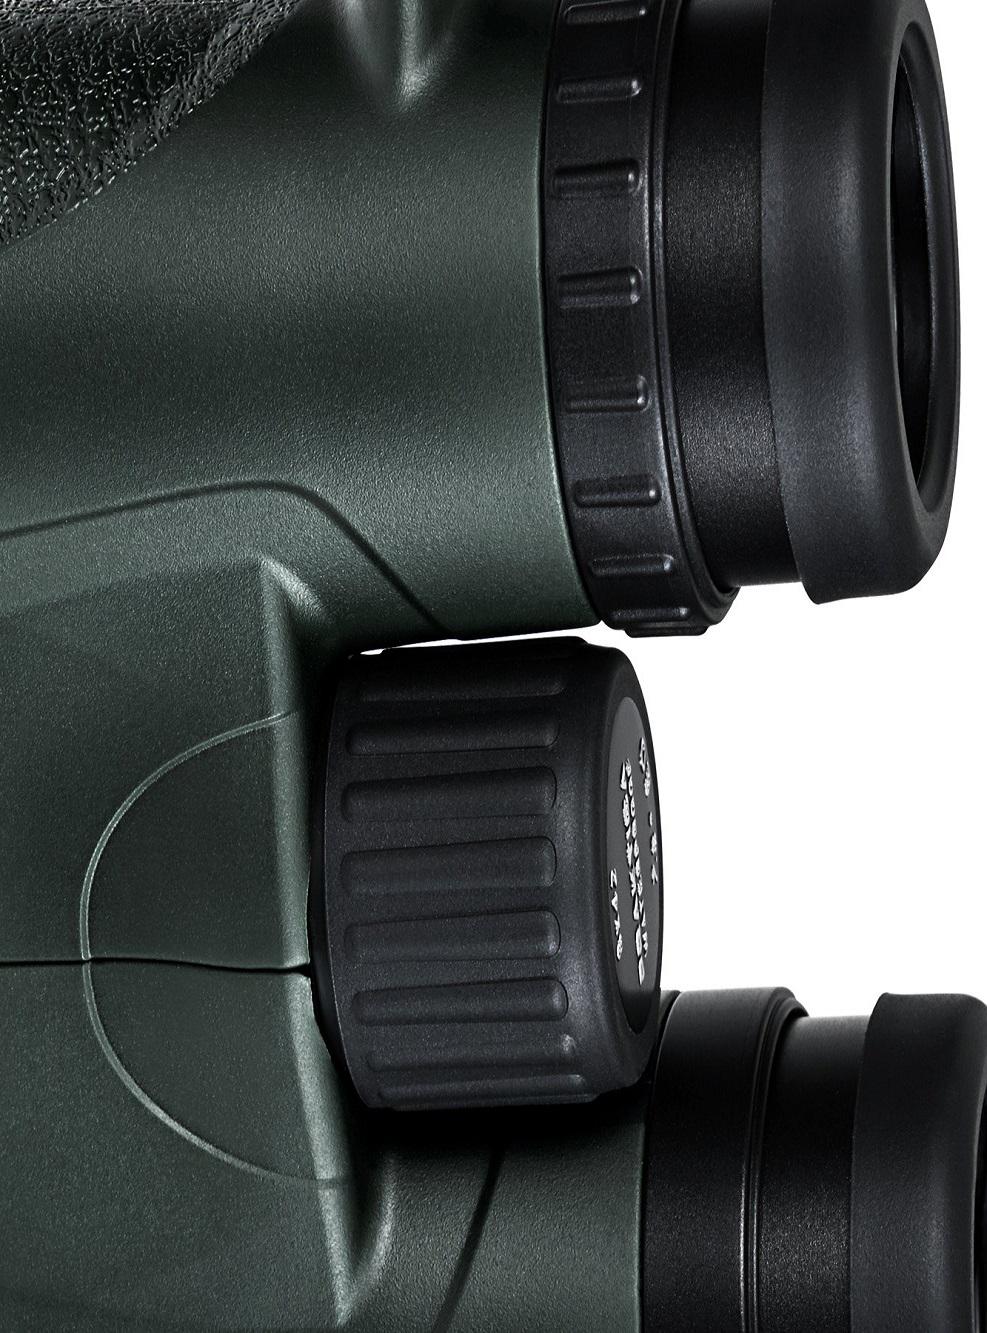 Praktica 8x42mm marquis ed wp binoculars bamfx842g £199.00 london